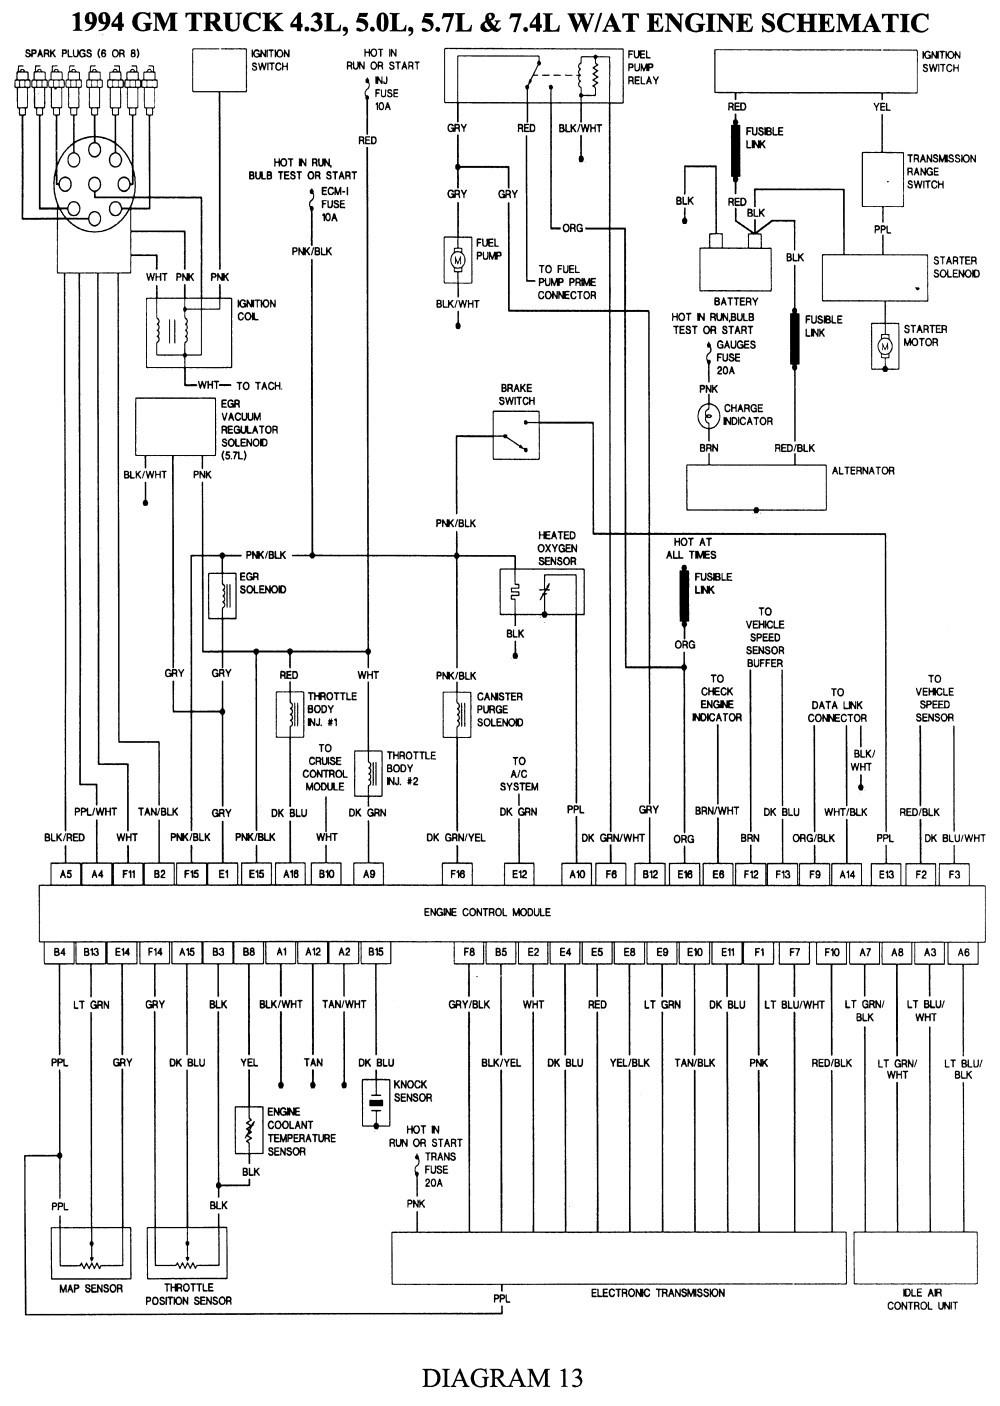 1994 chevy truck brake light wiring diagram luxury repair guides wiring diagrams wiring diagrams of 1994 chevy truck brake light wiring diagram